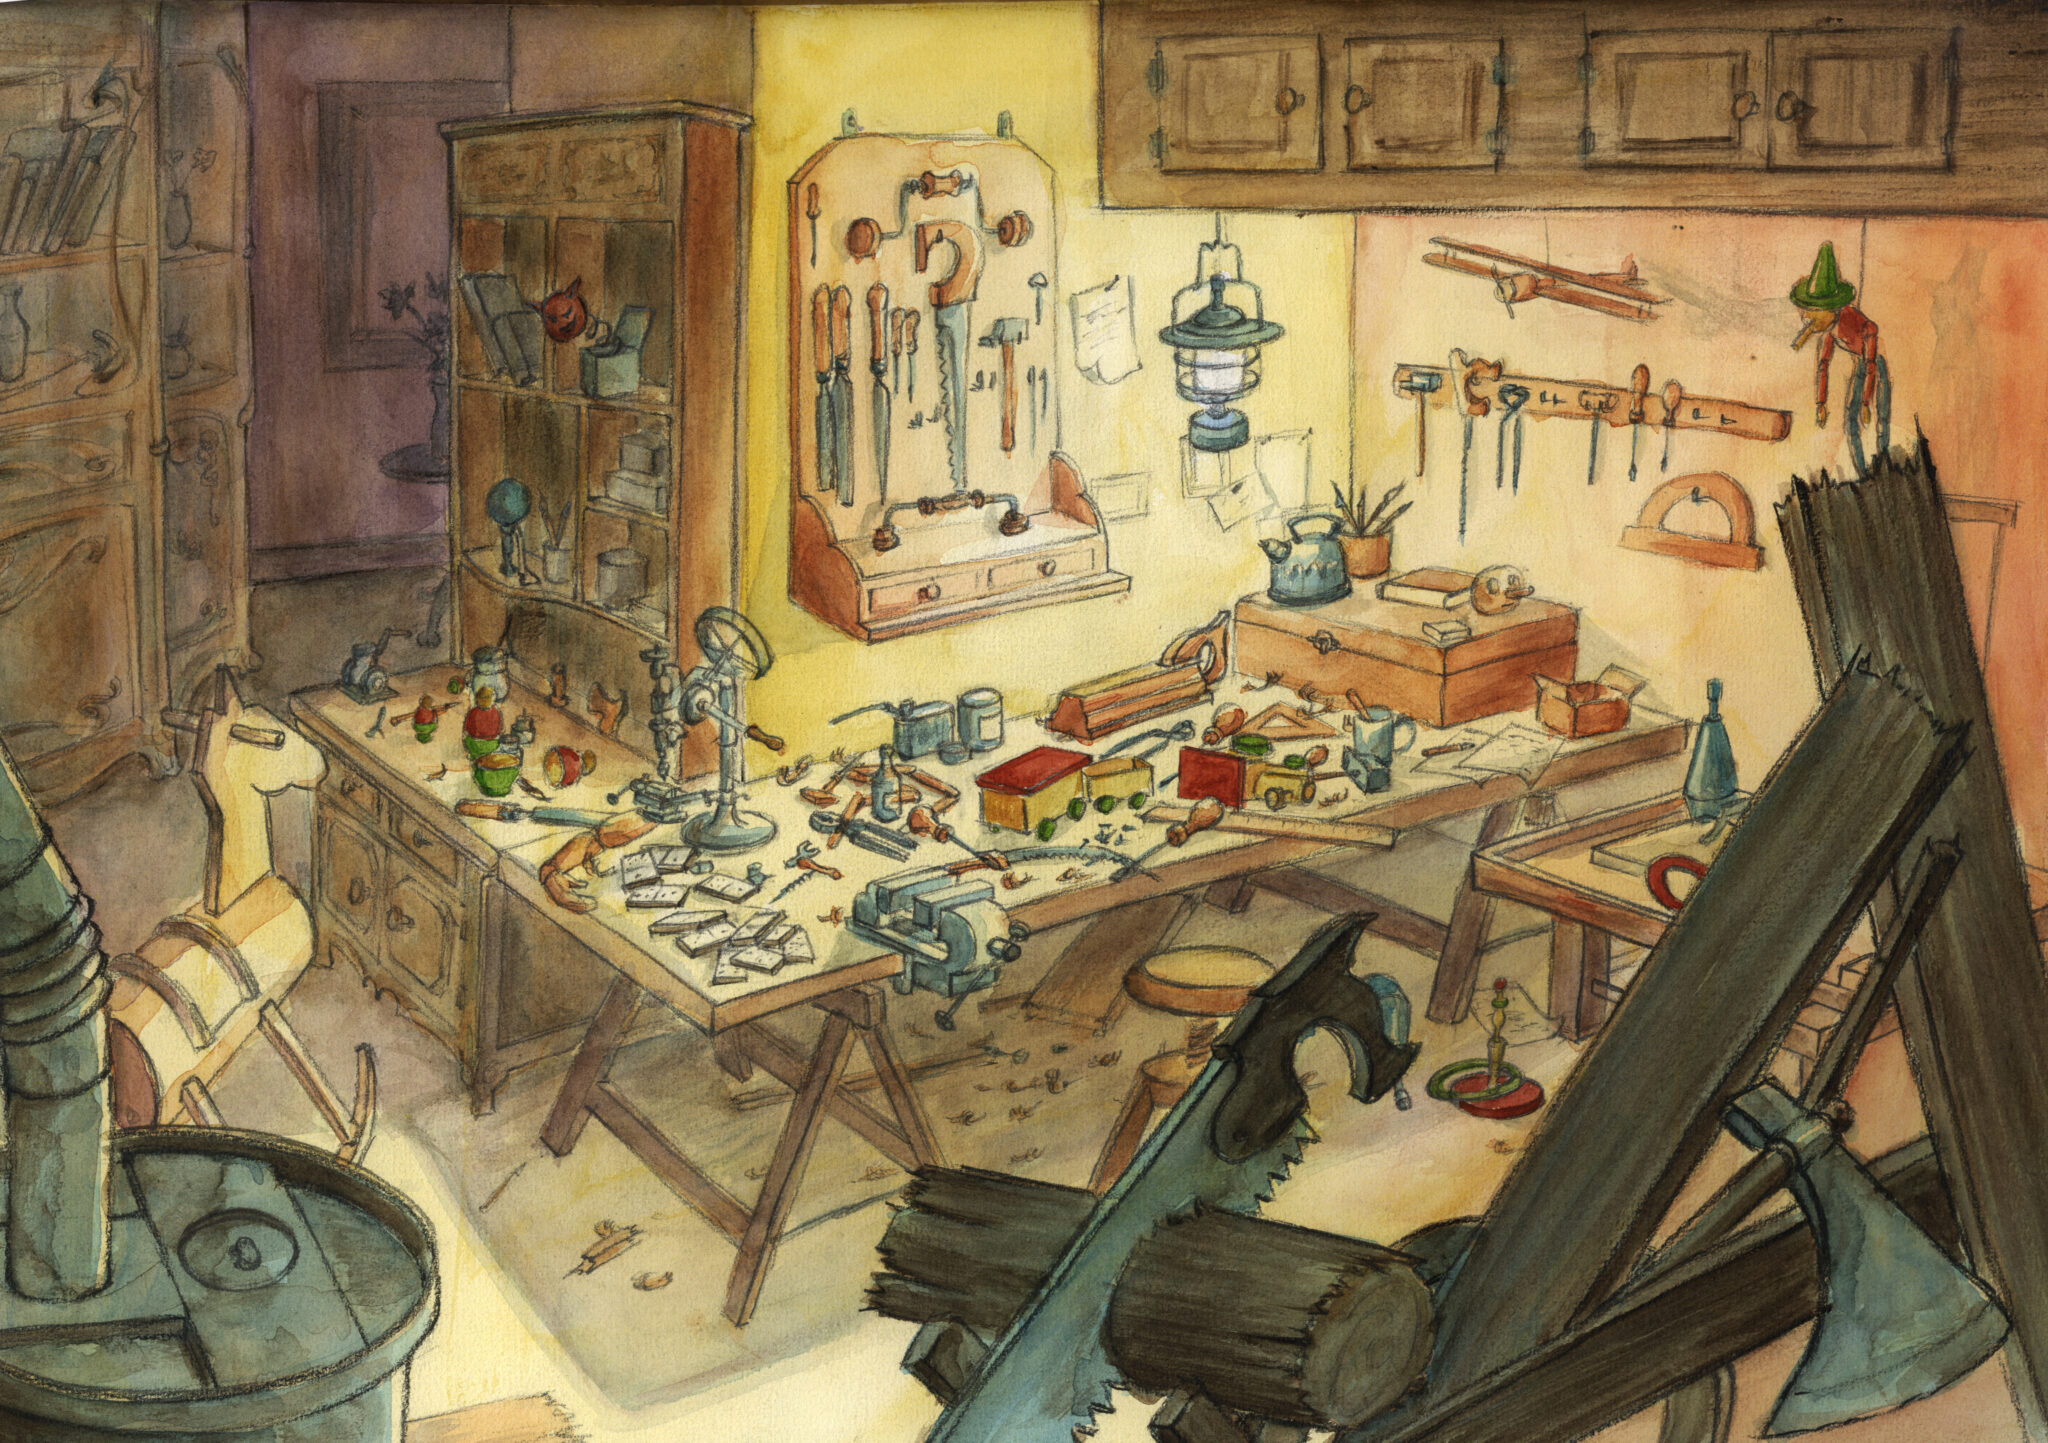 L'atelier de Gepetto (crayon, aquarelle)